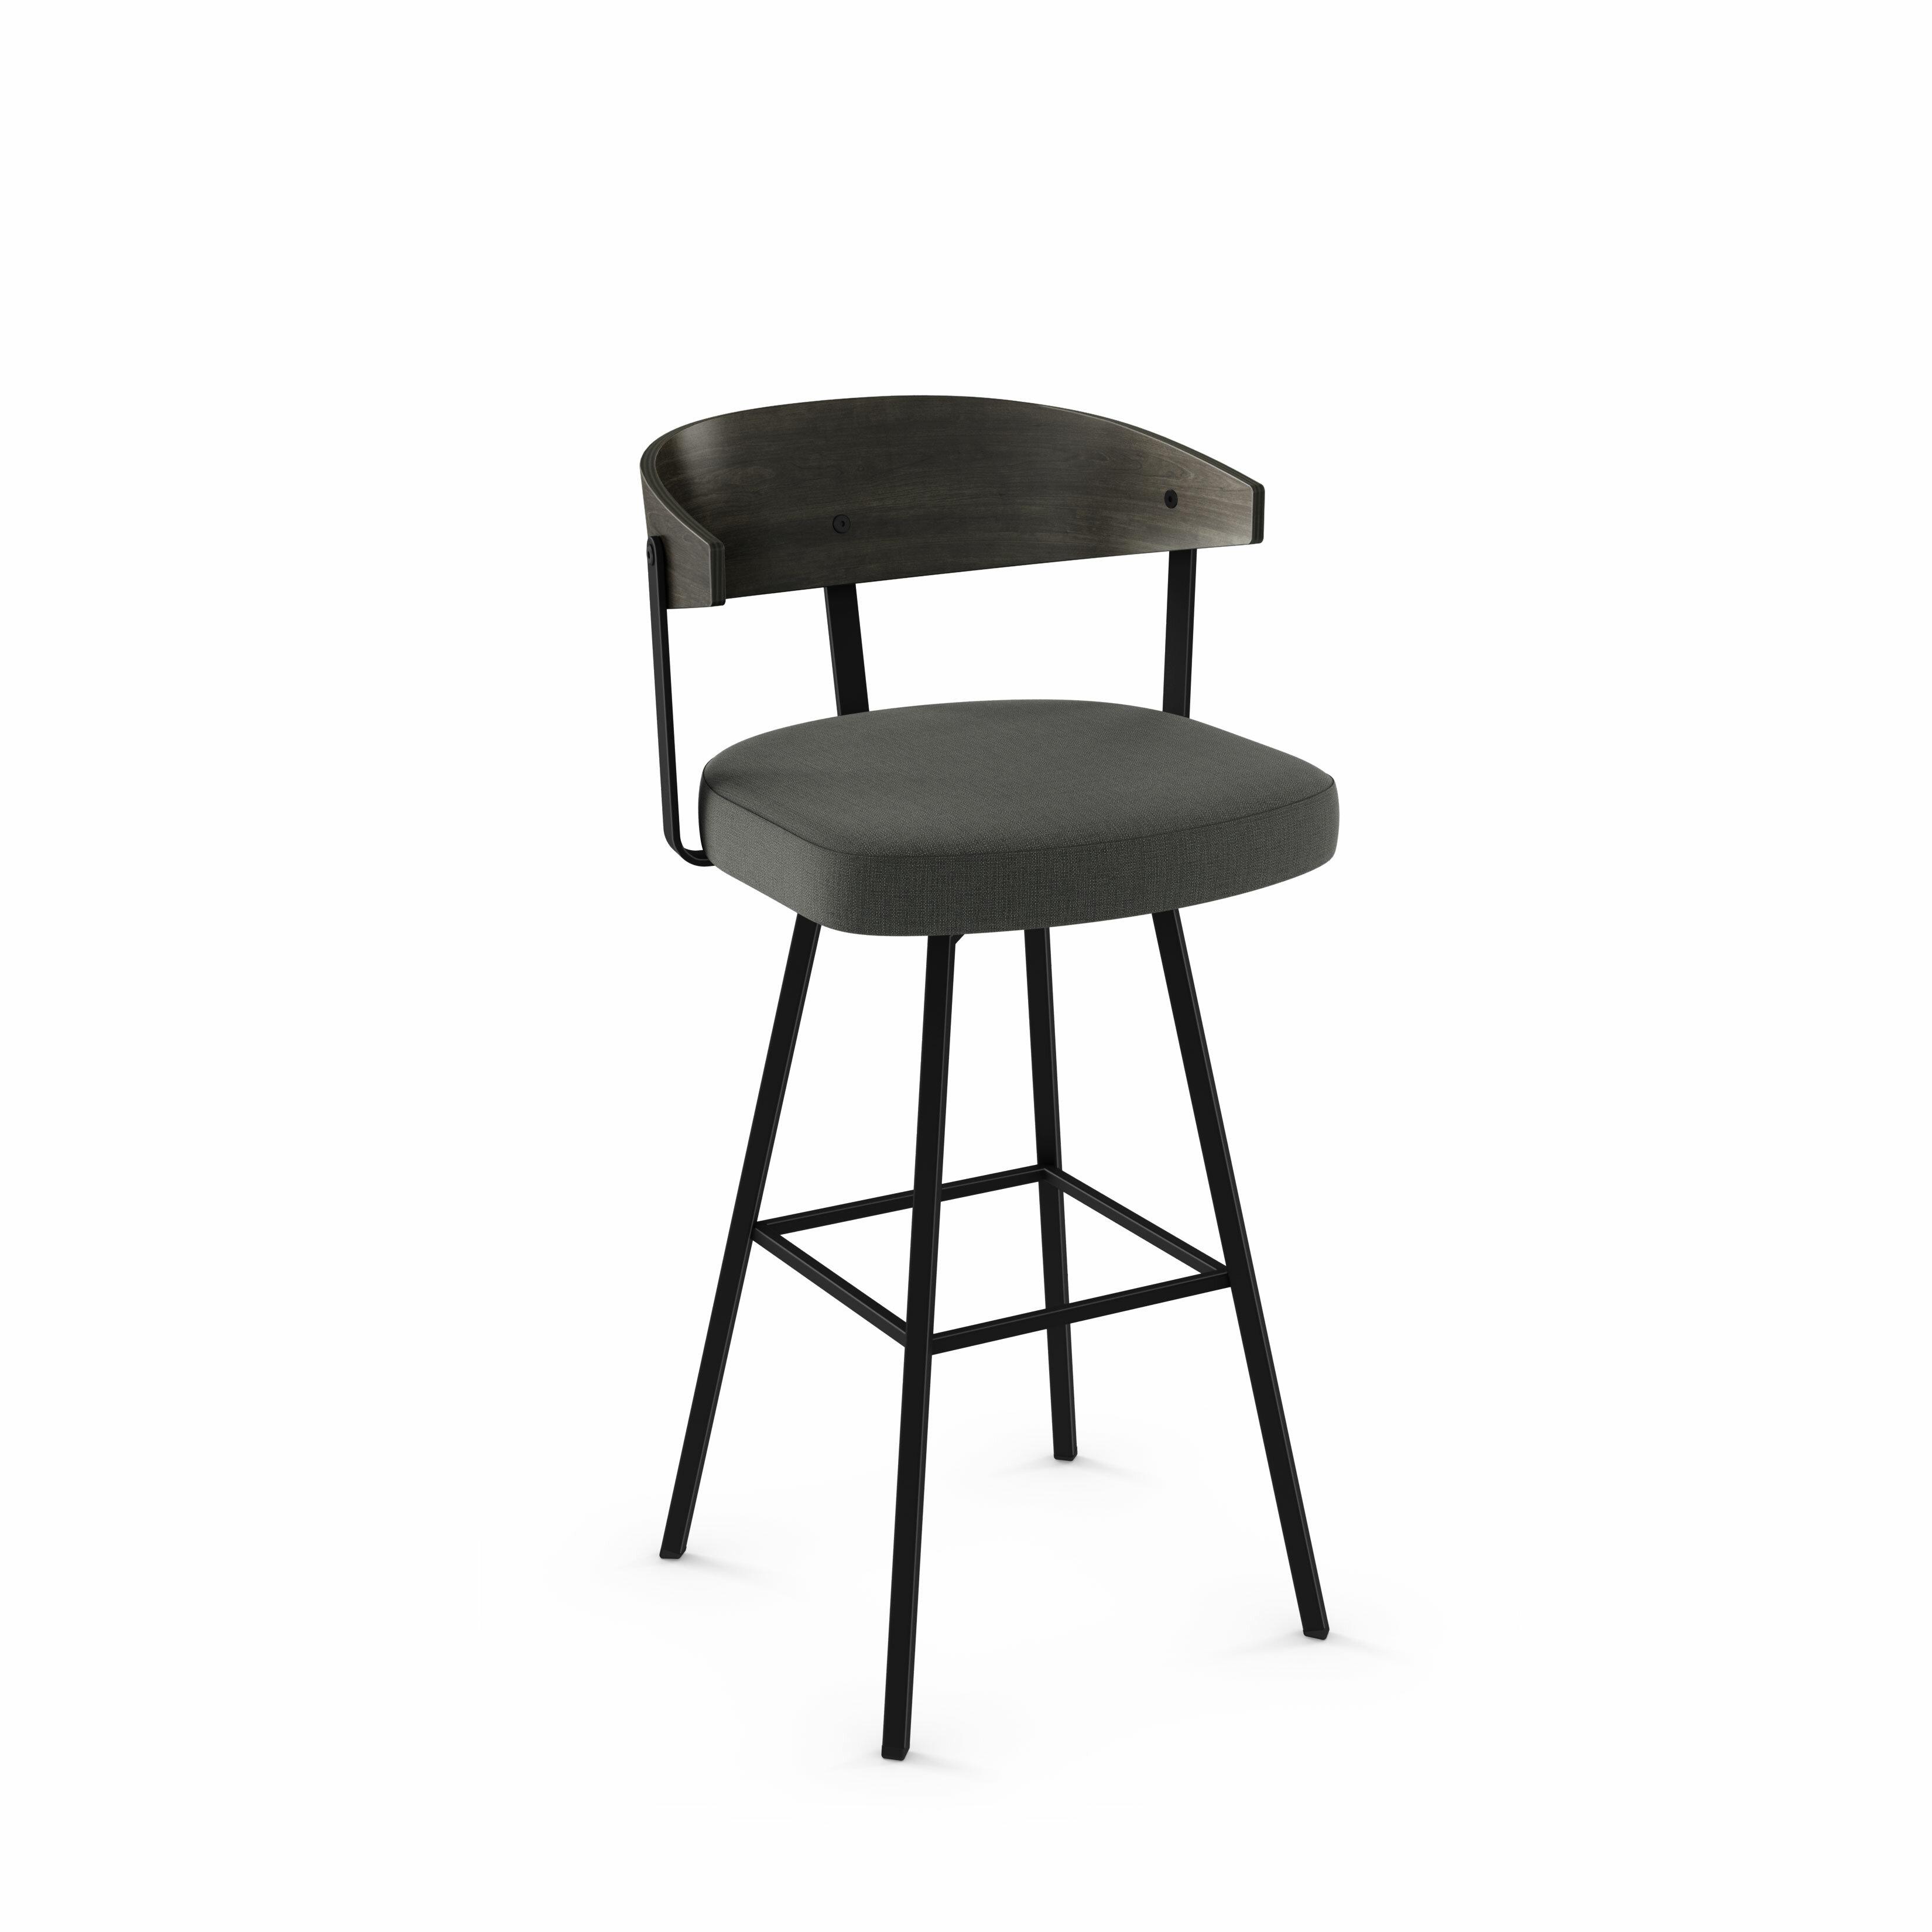 Enjoyable Amir 36 Swivel Bar Stool Ibusinesslaw Wood Chair Design Ideas Ibusinesslaworg